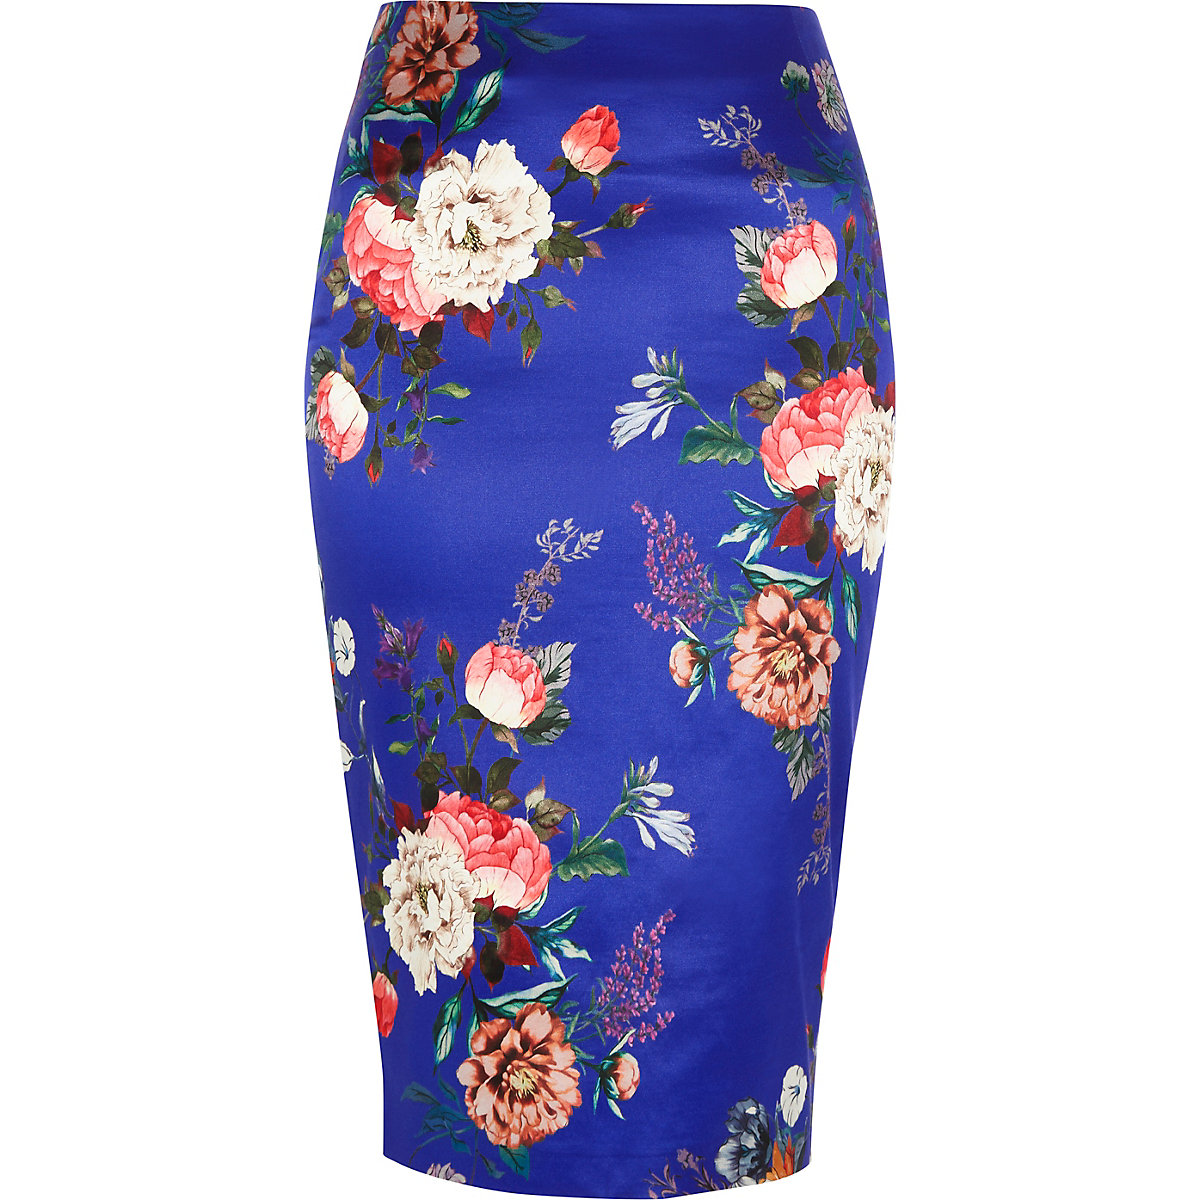 Blue floral print satin finish pencil skirt